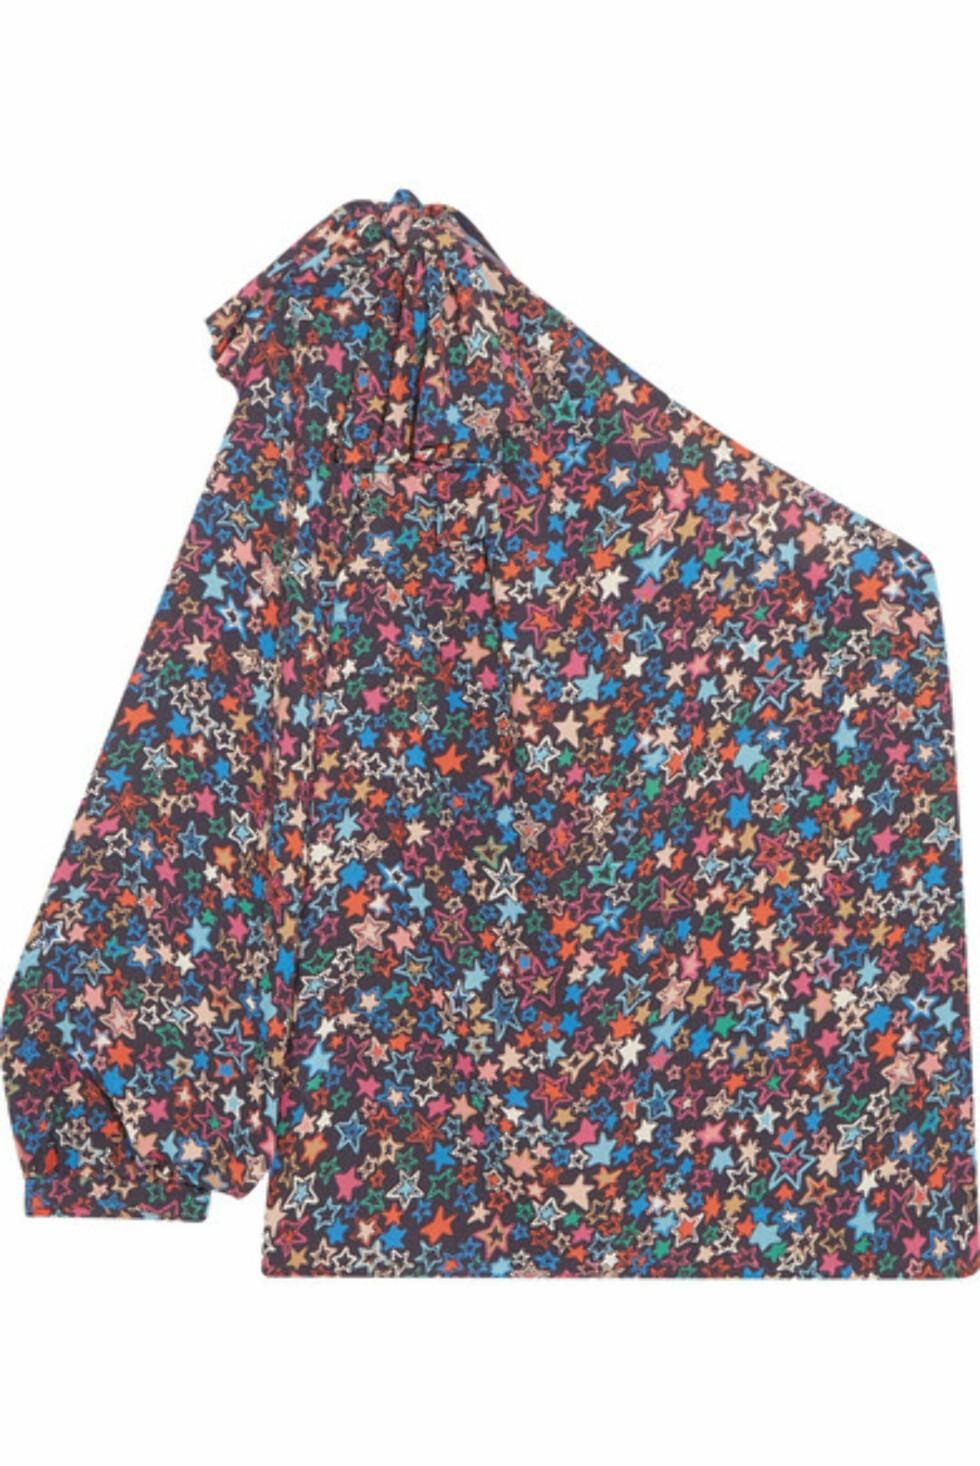 Fra J.CREW |1200,-| https://www.net-a-porter.com/no/en/product/975189/j_crew/jacuzzi-one-shoulder-printed-crepe-de-chine-top